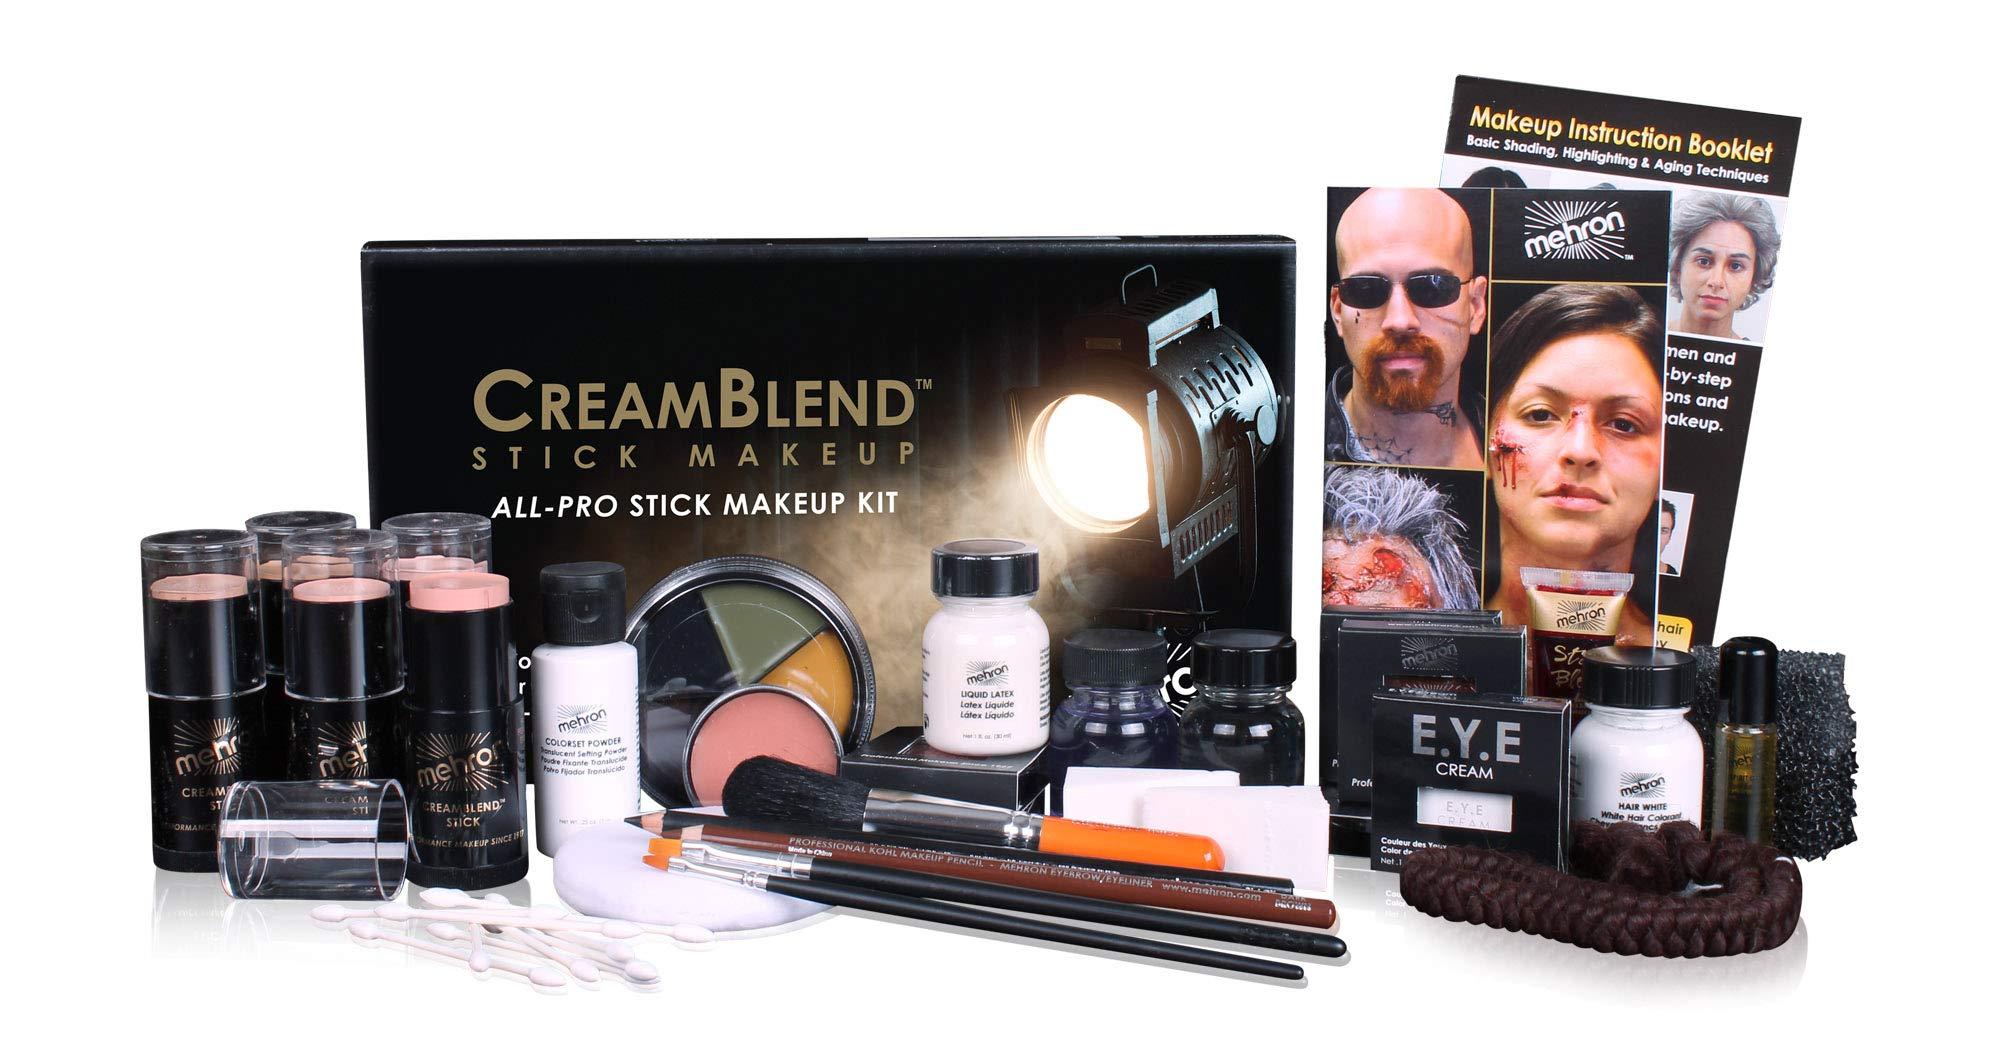 Mehron Makeup Creamblend All-Pro Student Makeup Kit (Fair) by Mehron (Image #1)